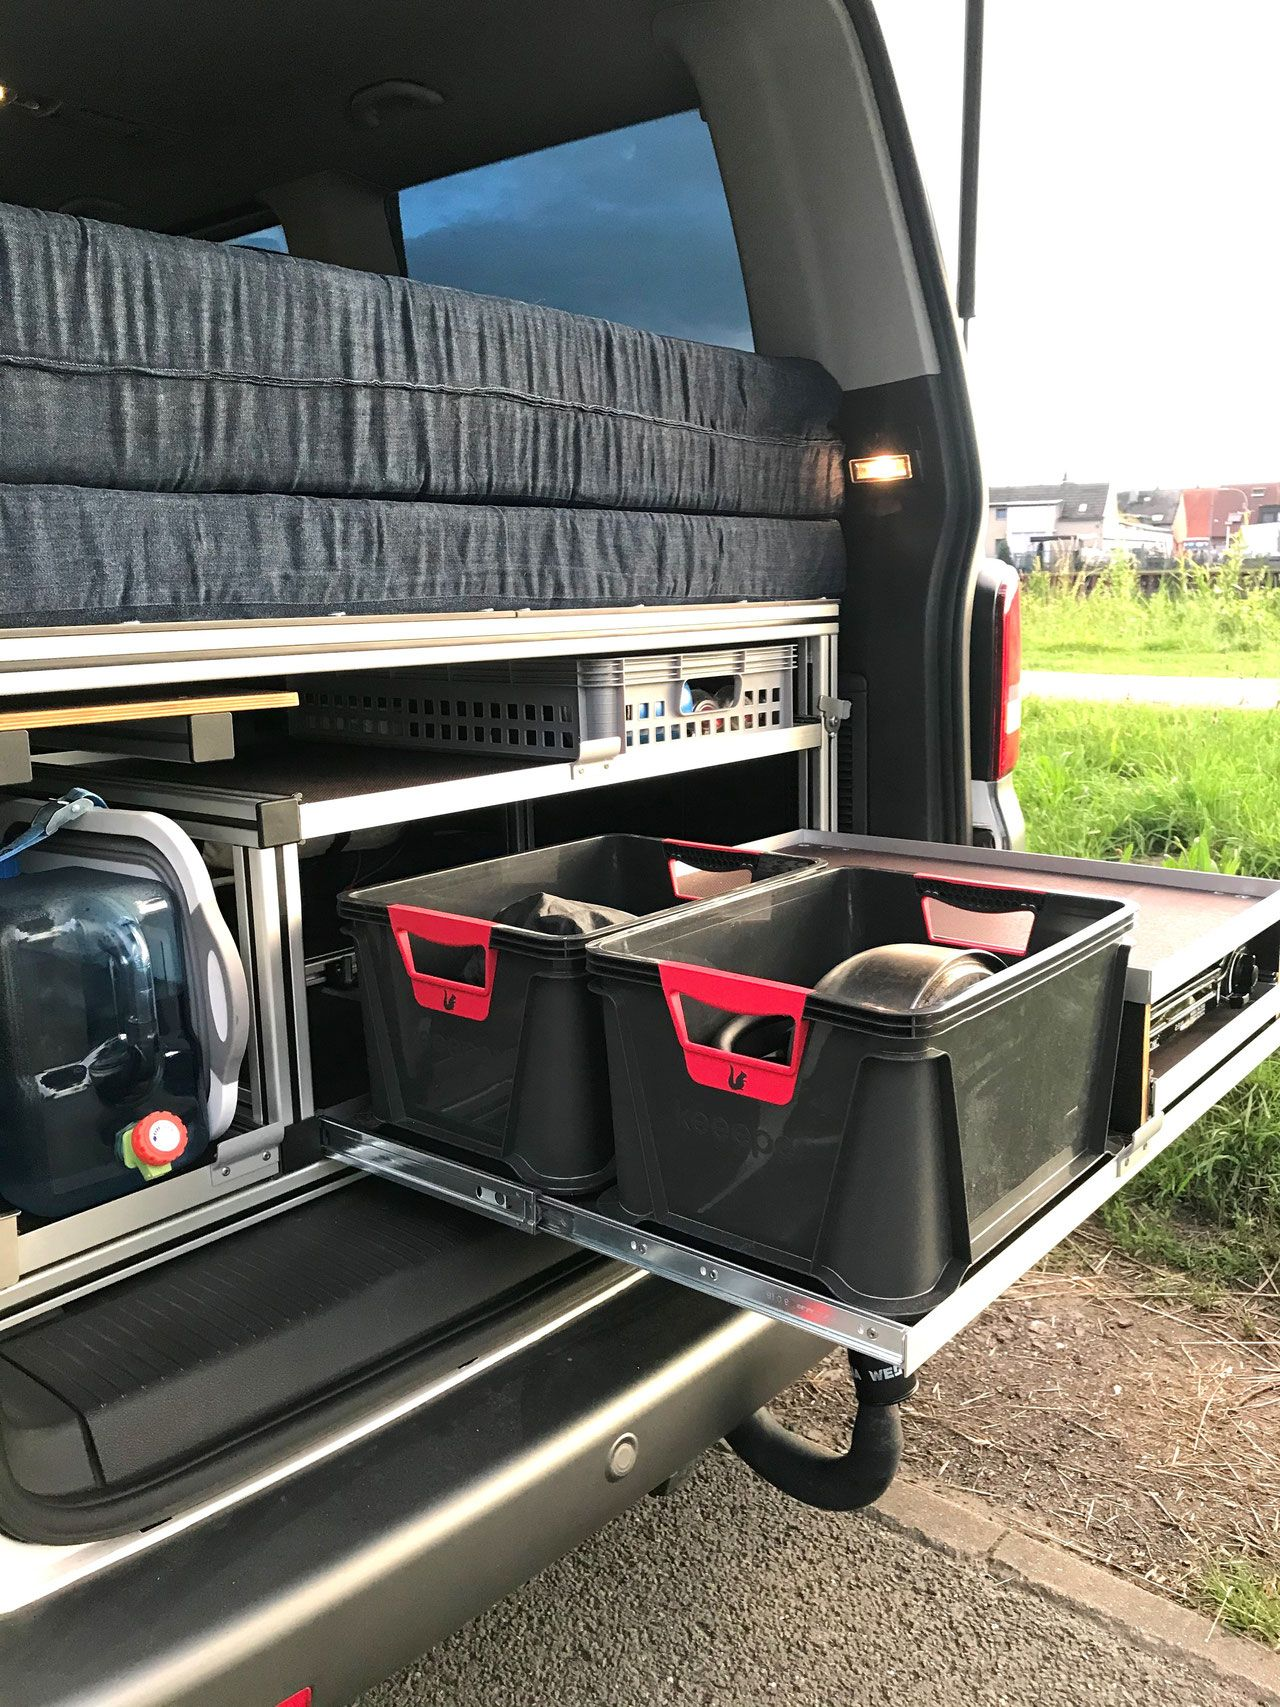 Vanlife Bus Mobelbau Mobeldesign Campingmodule Ideen T5 T6 V Klasse In 2020 Camping Vw T5 Wohnwagen